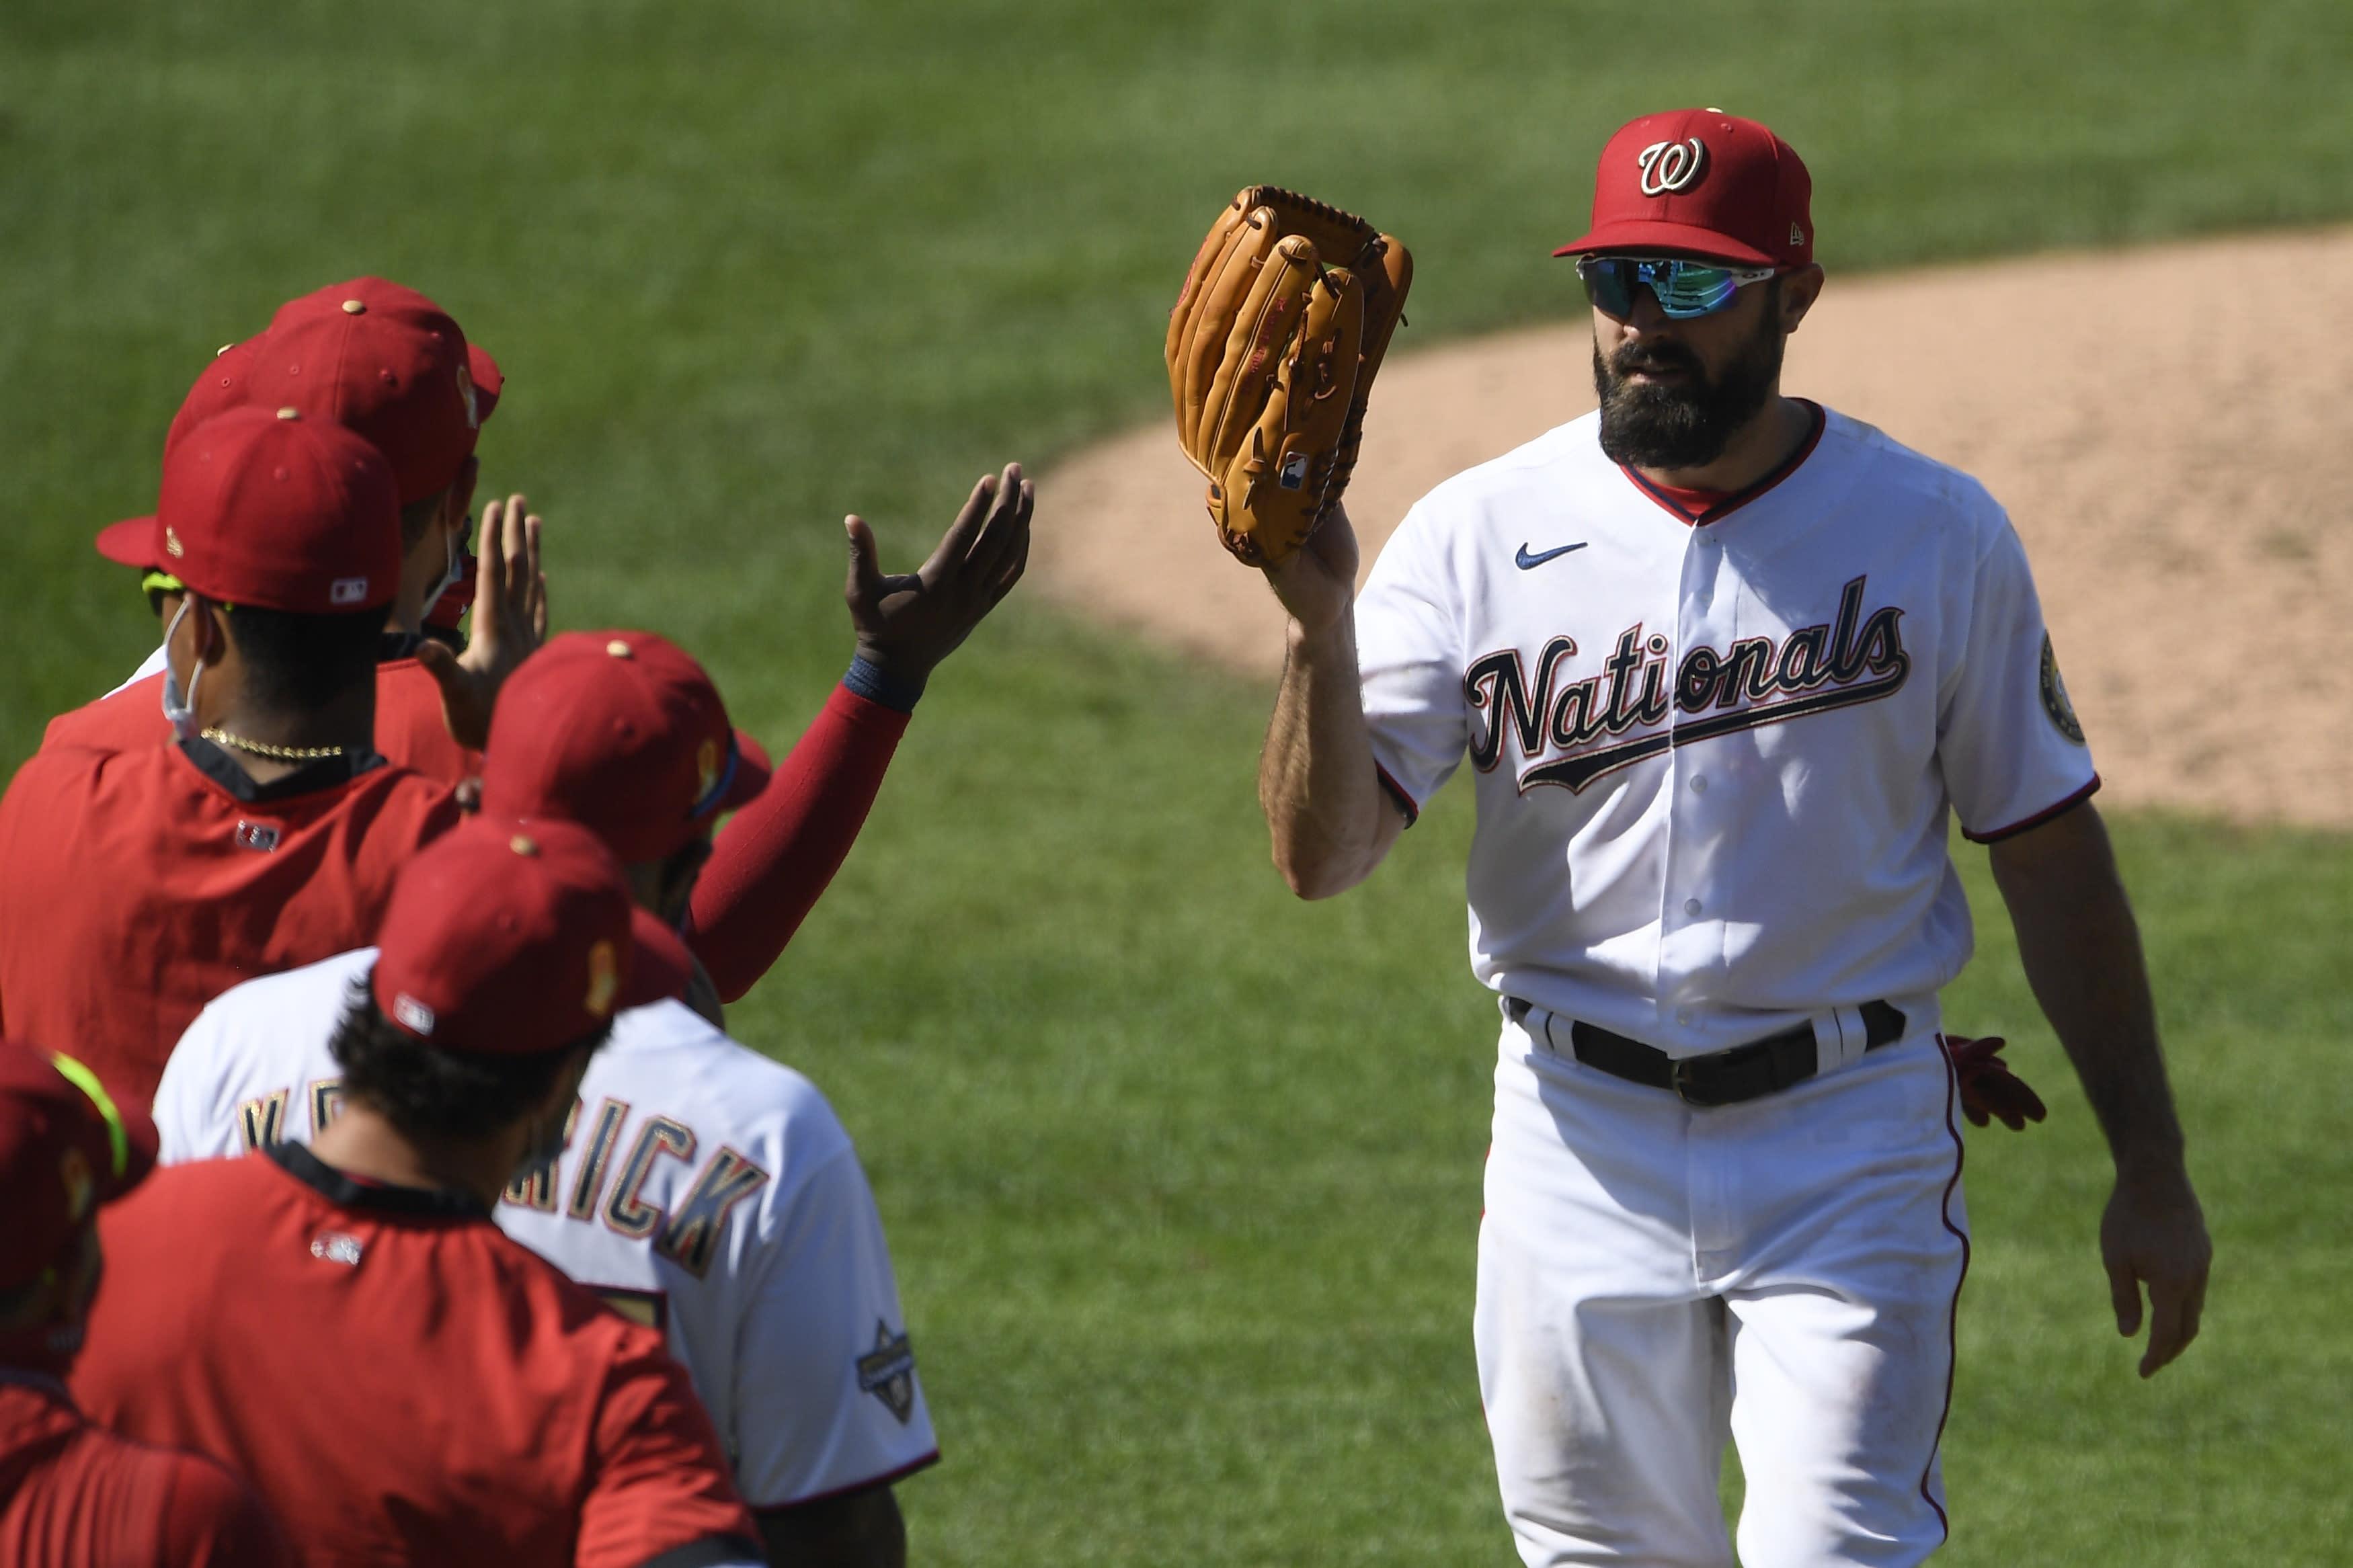 Washington Nationals' Adam Eaton celebrates after a baseball game against the Miami Marlins, Sunday, Aug. 23, 2020, in Washington. (AP Photo/Nick Wass)